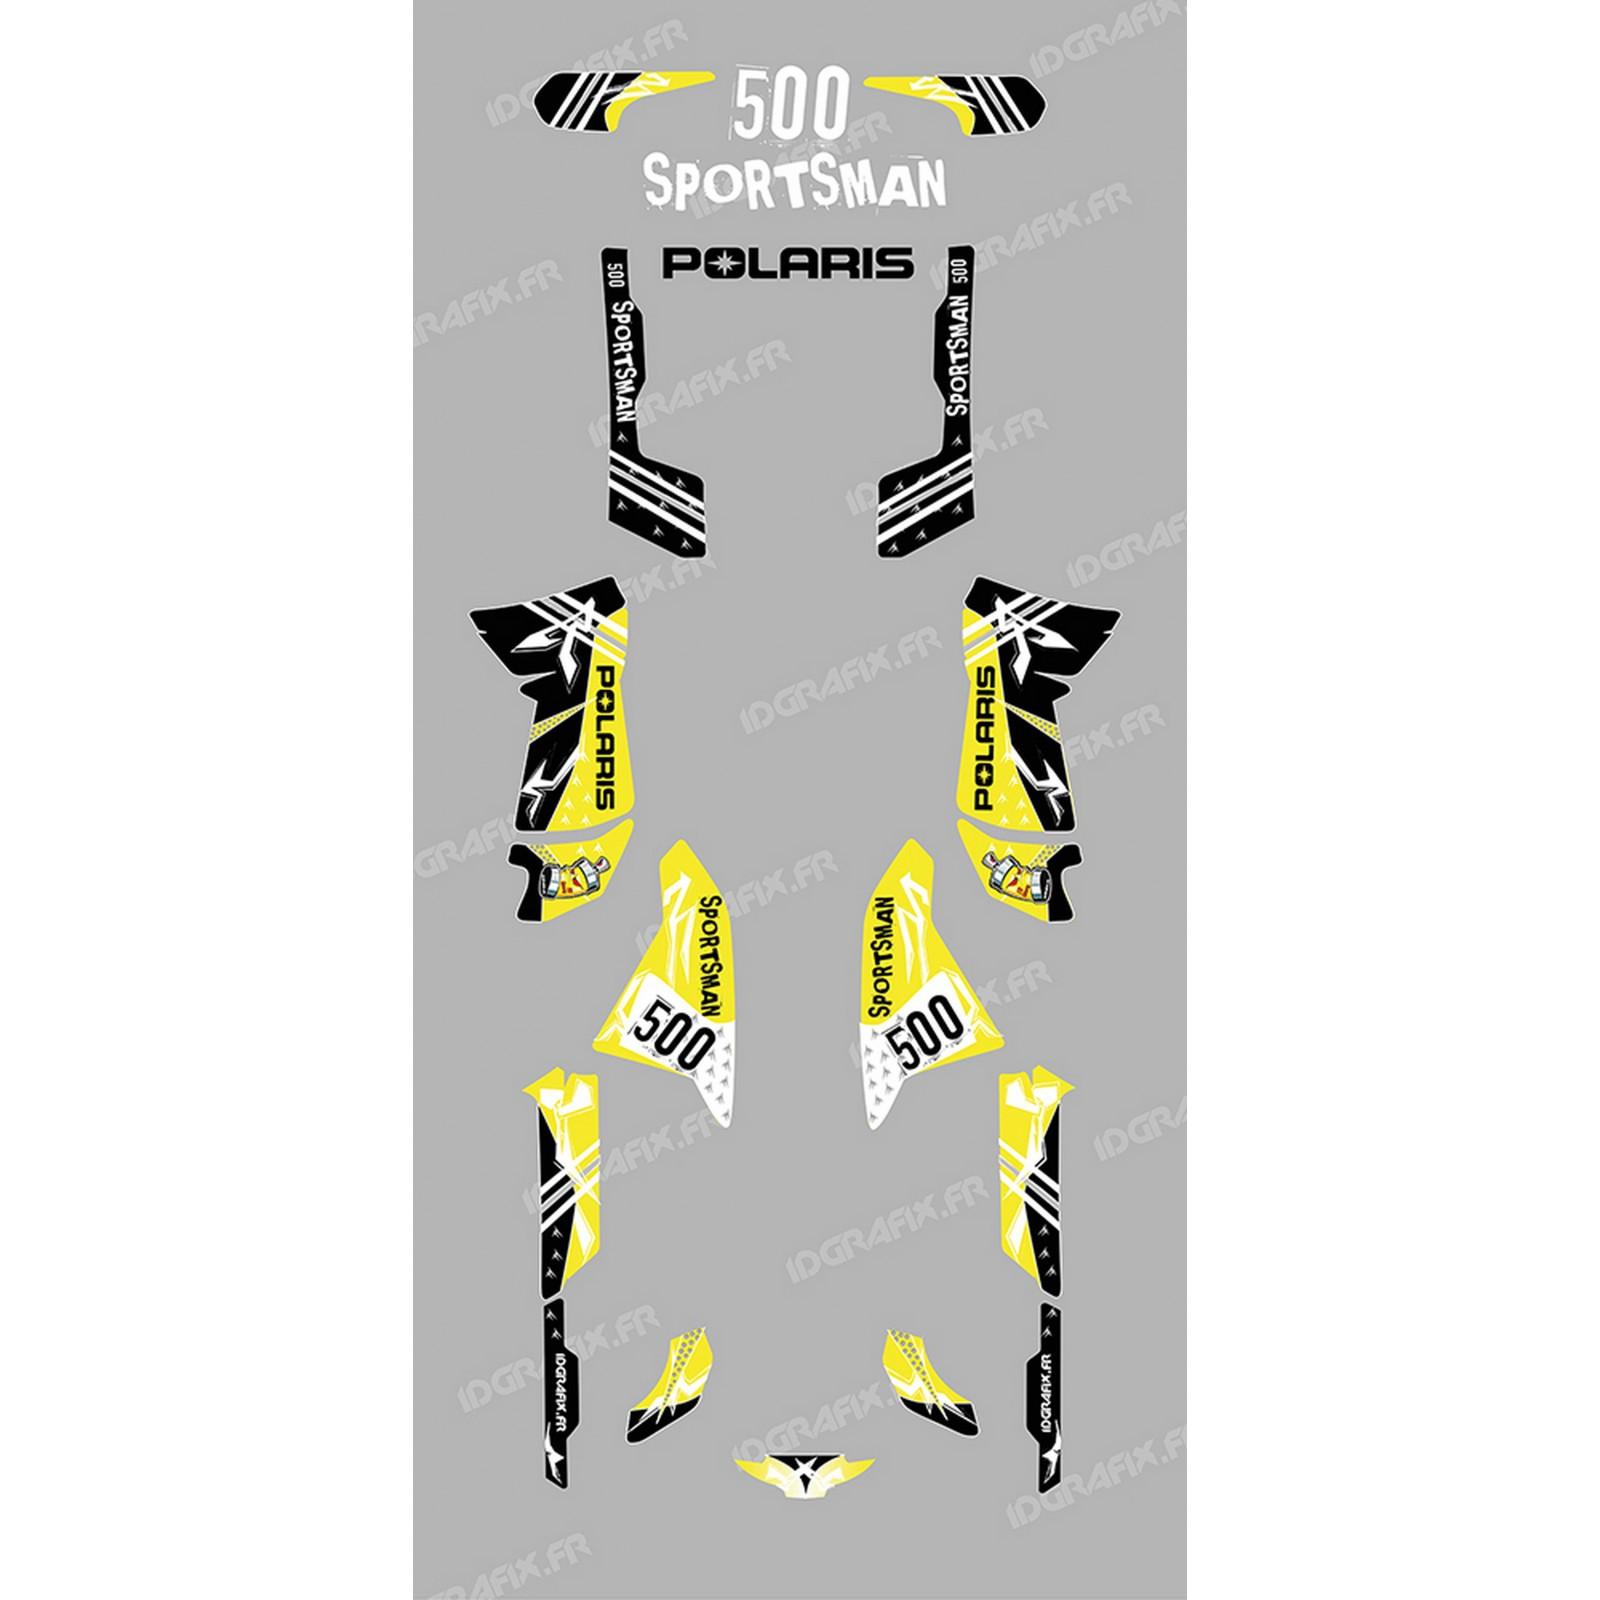 photo du kit décoration , Kit décoration Street Jaune , IDgrafix , Polaris 500 Sportsman